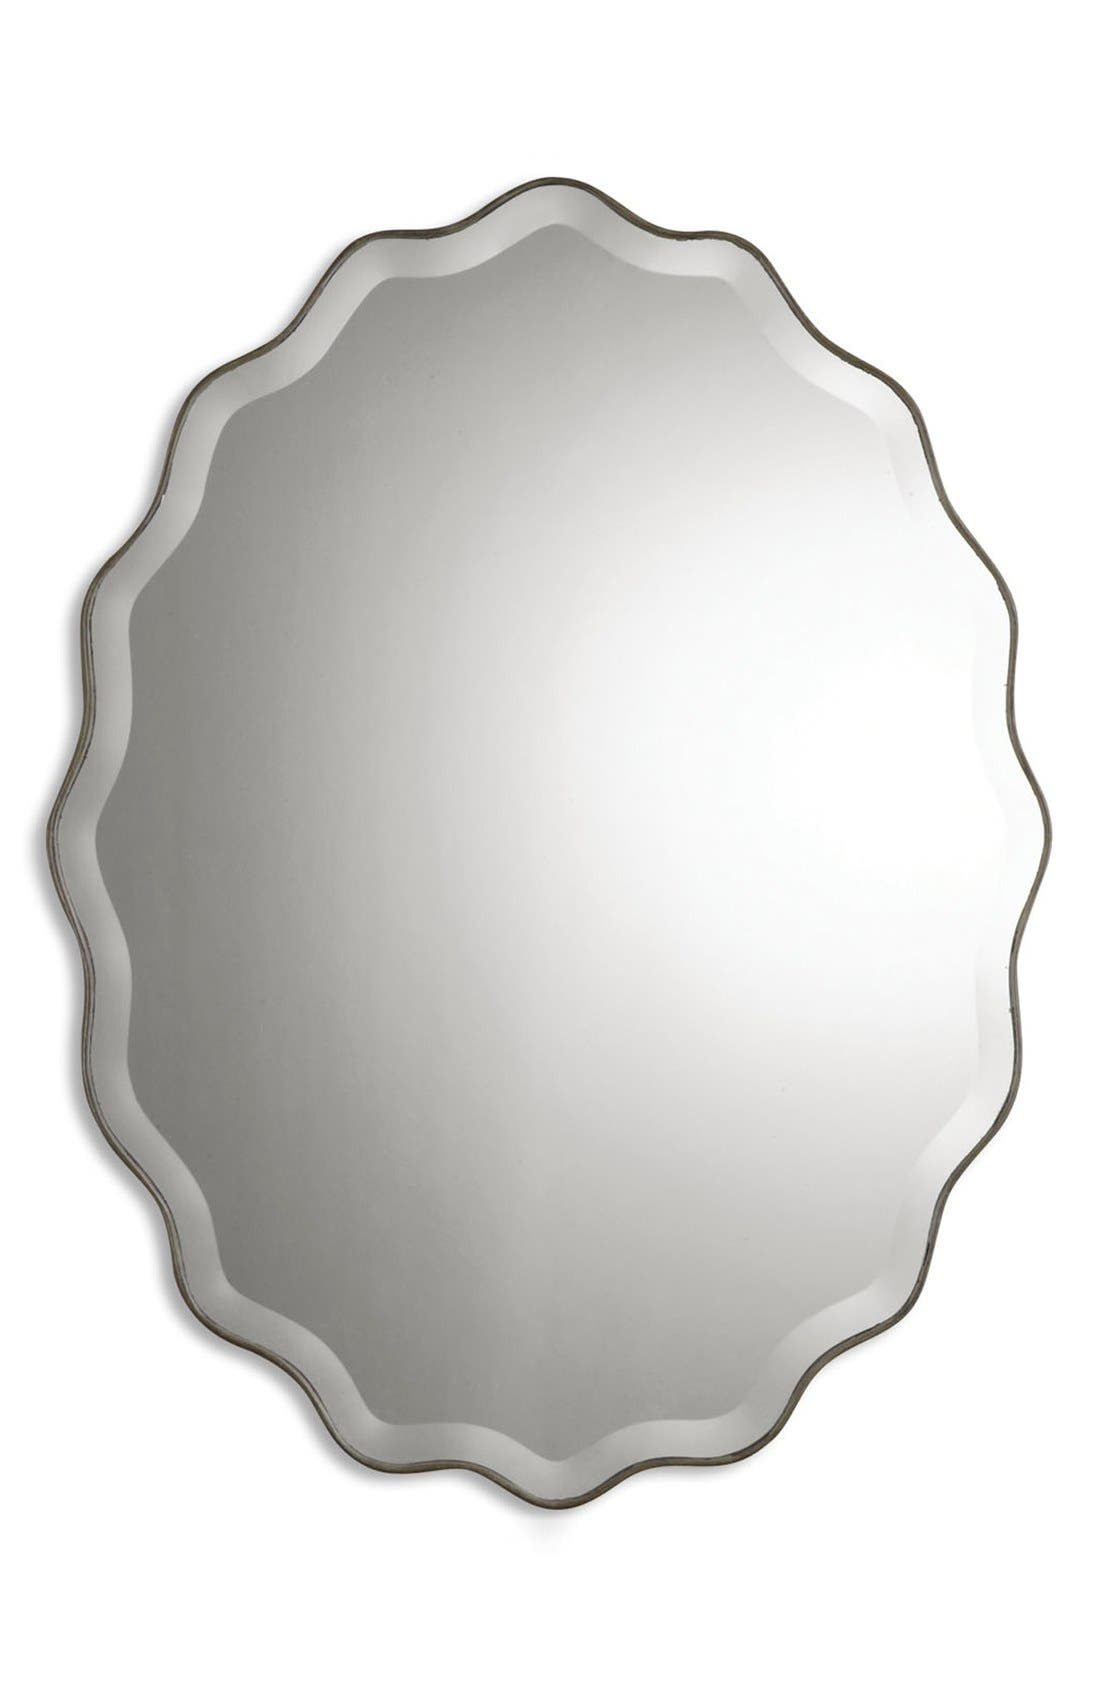 Alternate Image 1 Selected - Uttermost 'Teodora' Ruffle Edge Mirror